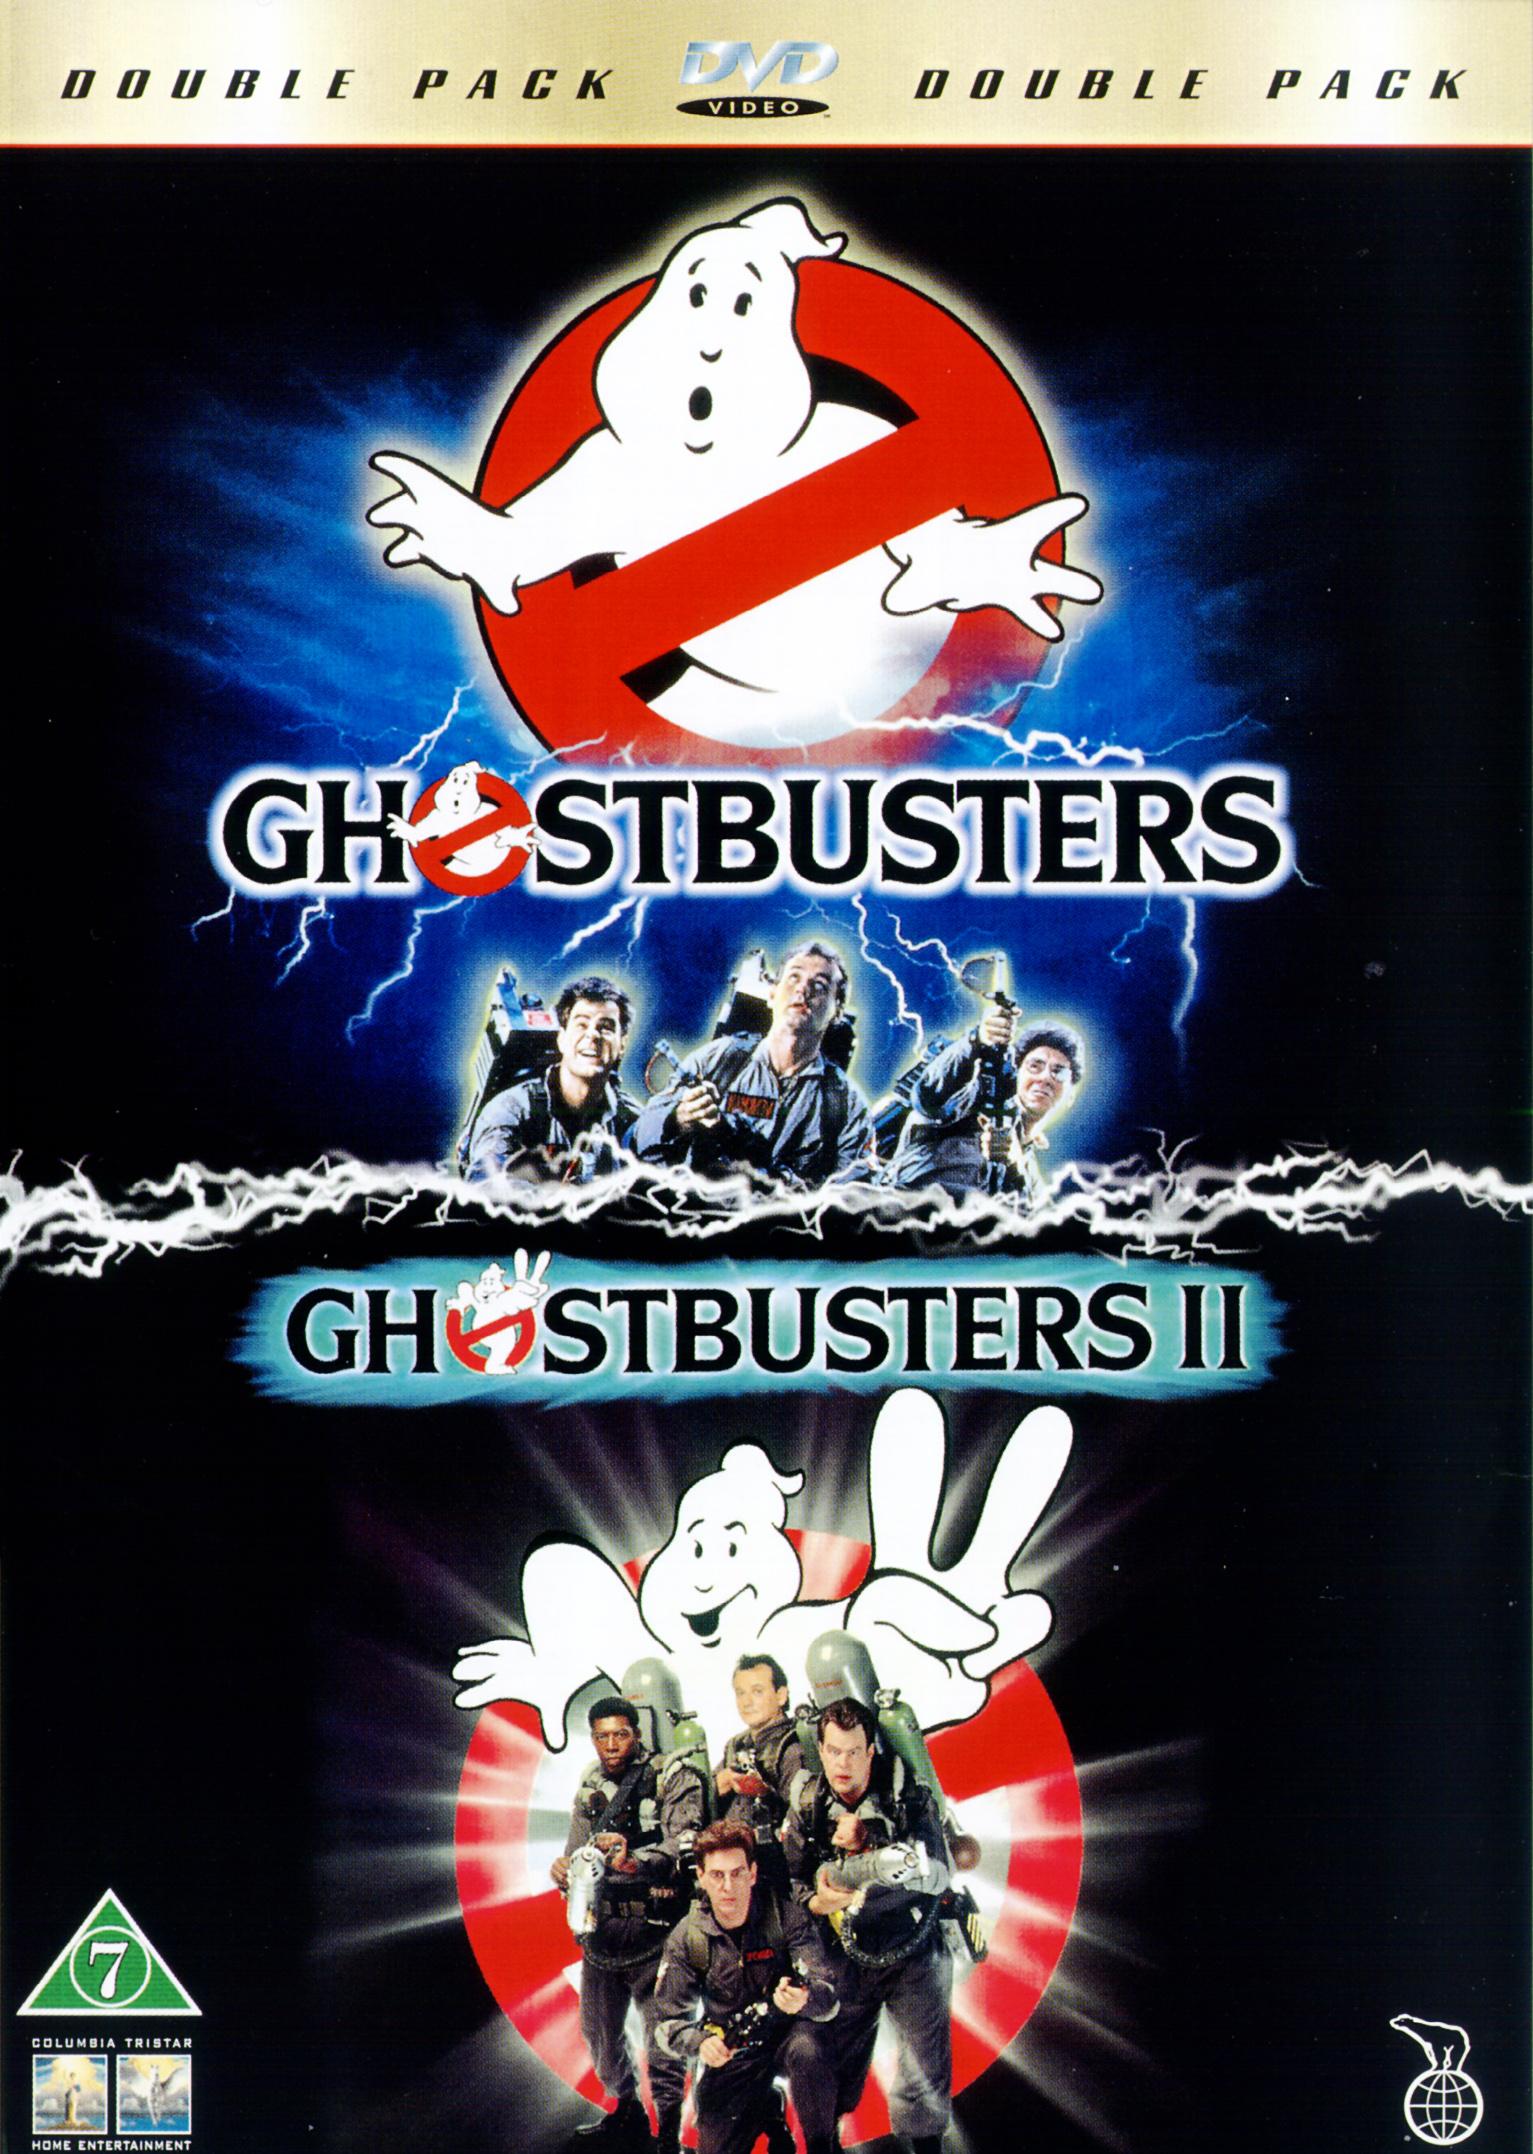 Ghostbusters 2016 music video clip   охотники за привидениями.